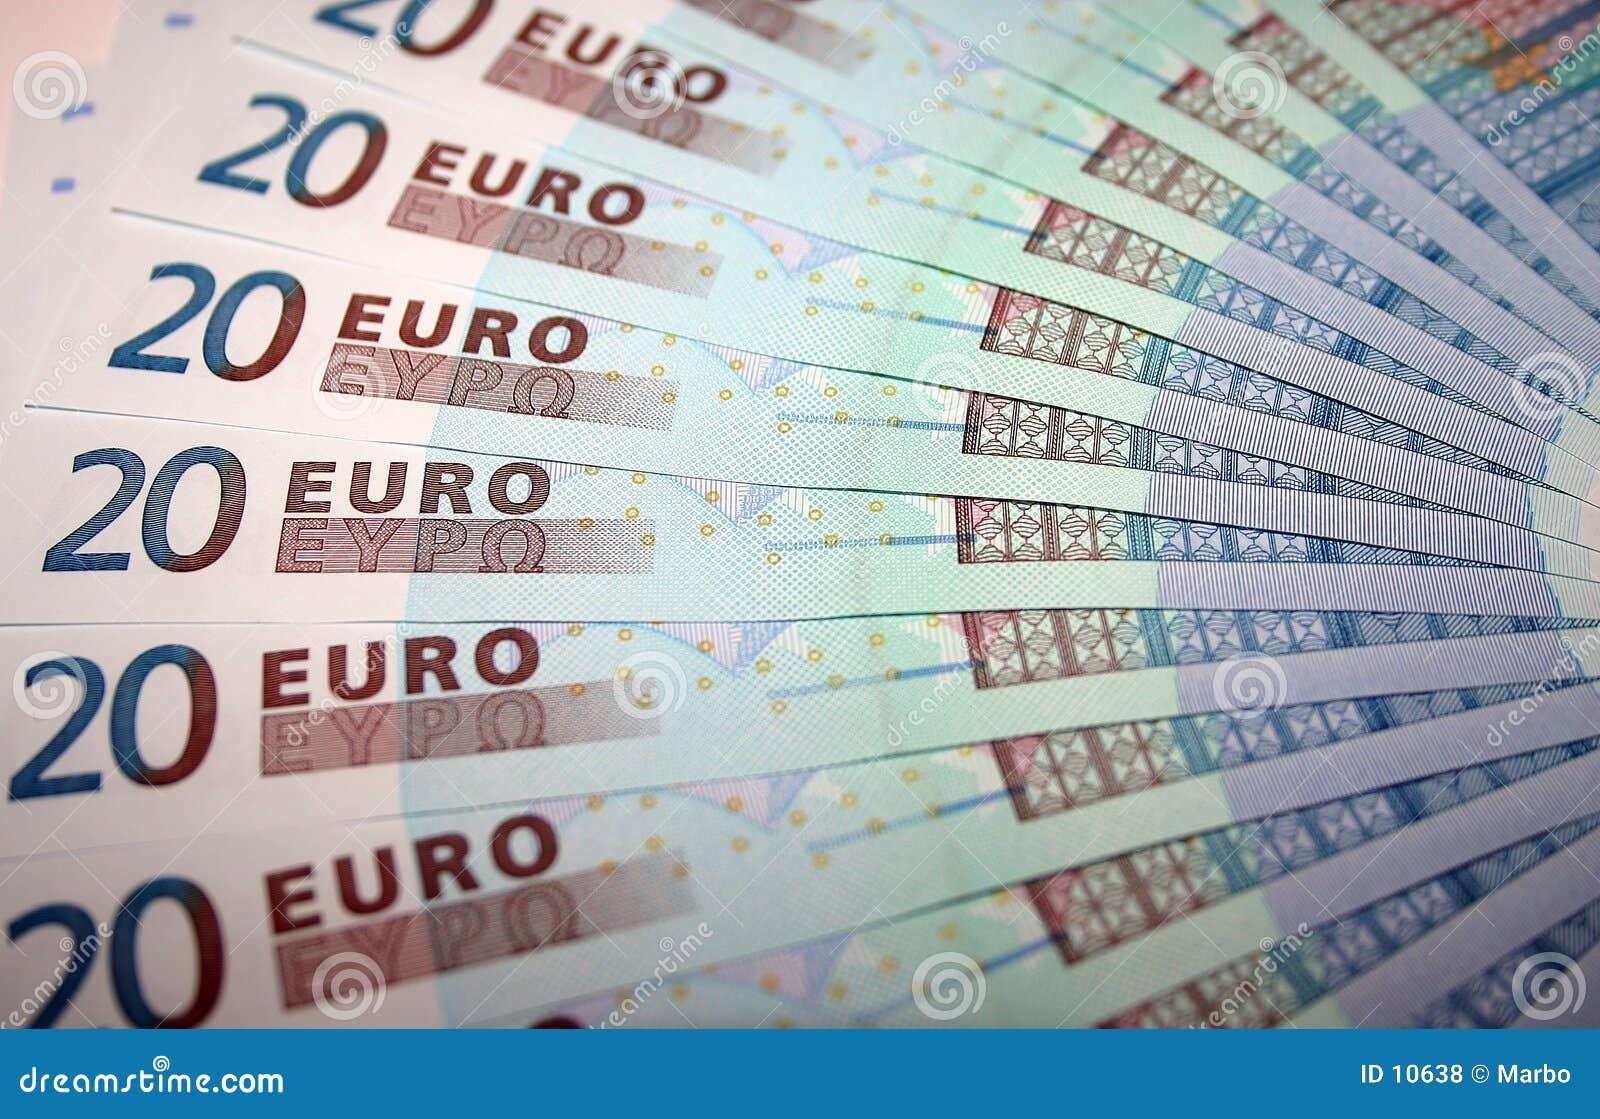 20 Euroanmerkungen